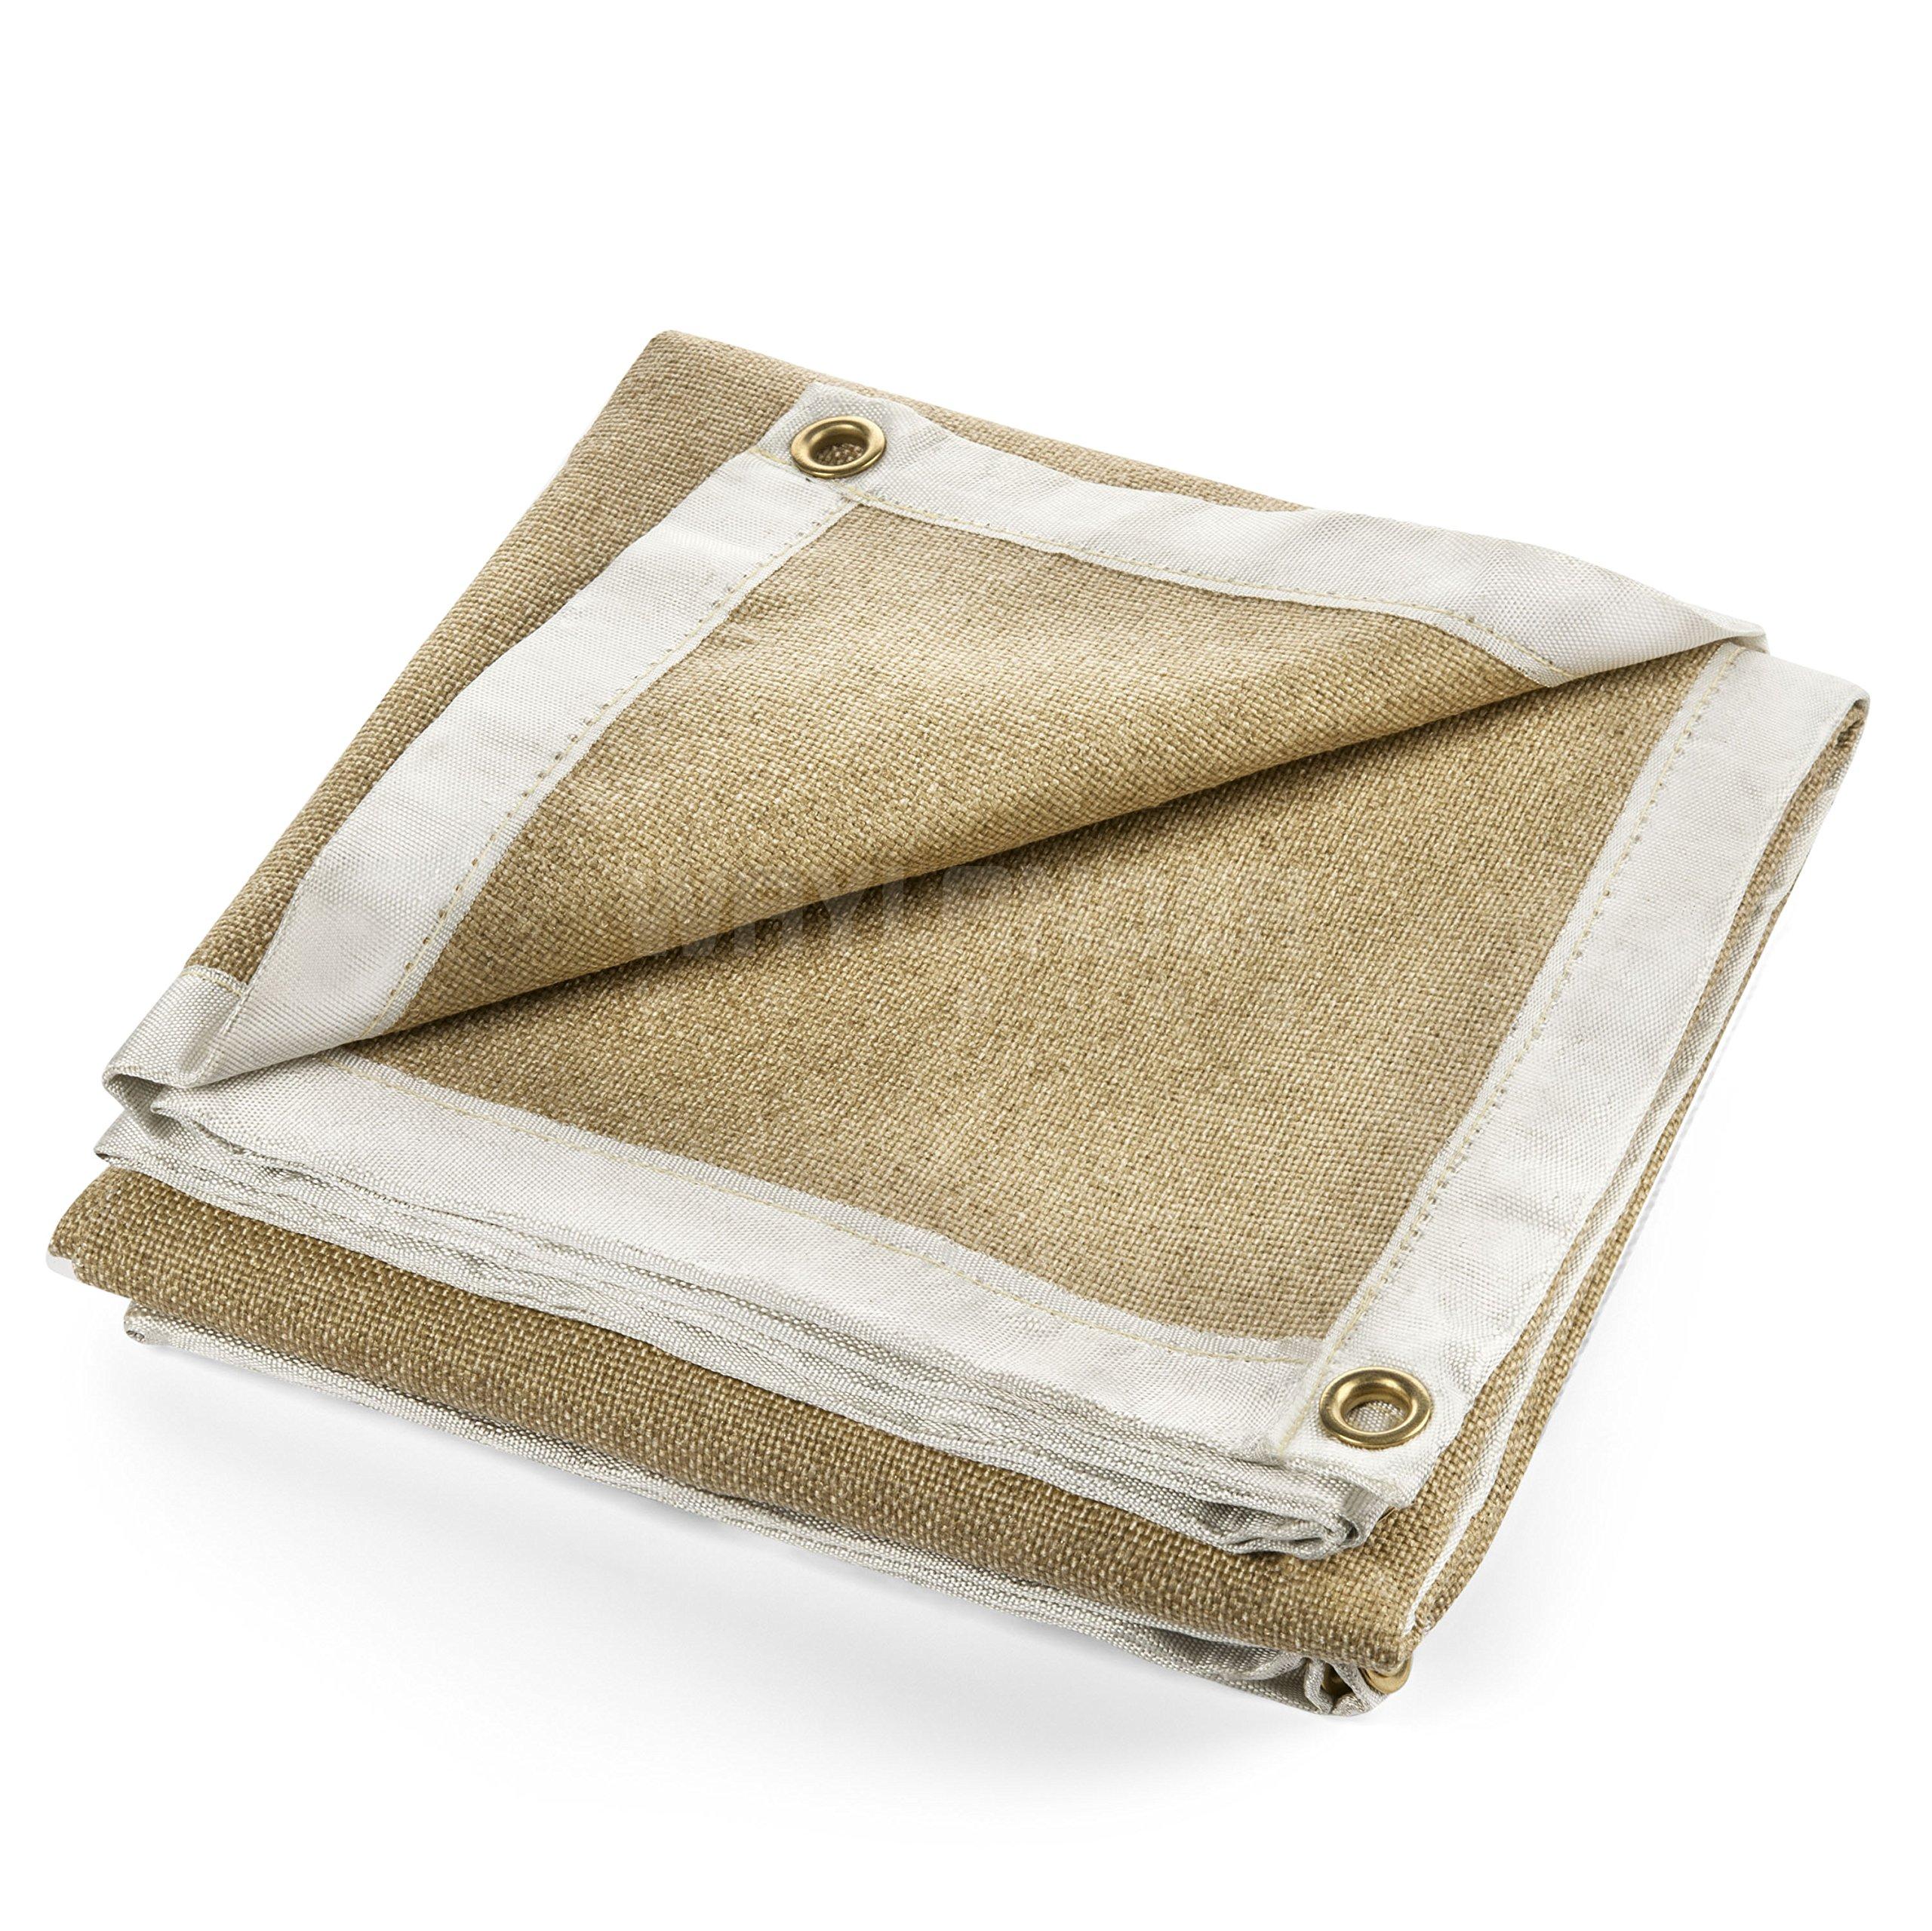 Waylander Premium Welding Blanket 4' x 6' 1400°F Heavy Duty Kevlar Stitched Vermiculite Impregnated Fiberglass with Brass Grommets